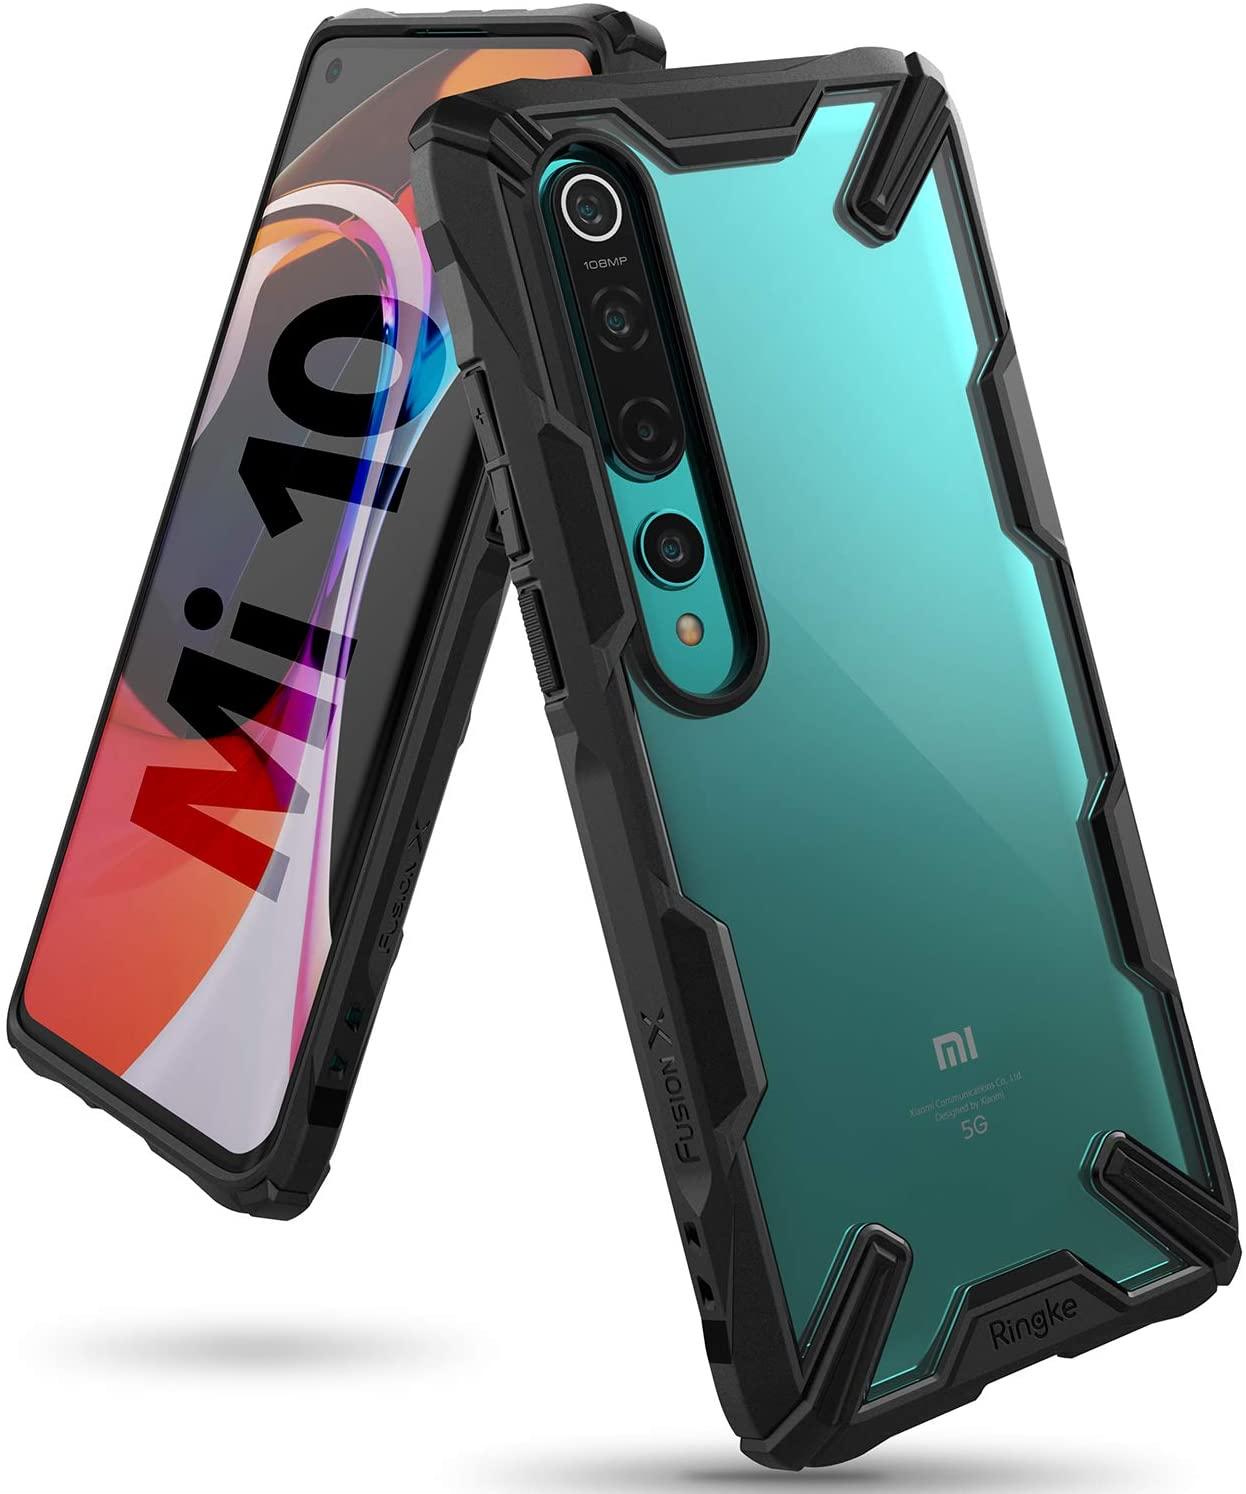 Capa Ringke Fusion X - Xiaomi Mi 10 / Xiaomi Mi 10 Pro (Tela 6.67)